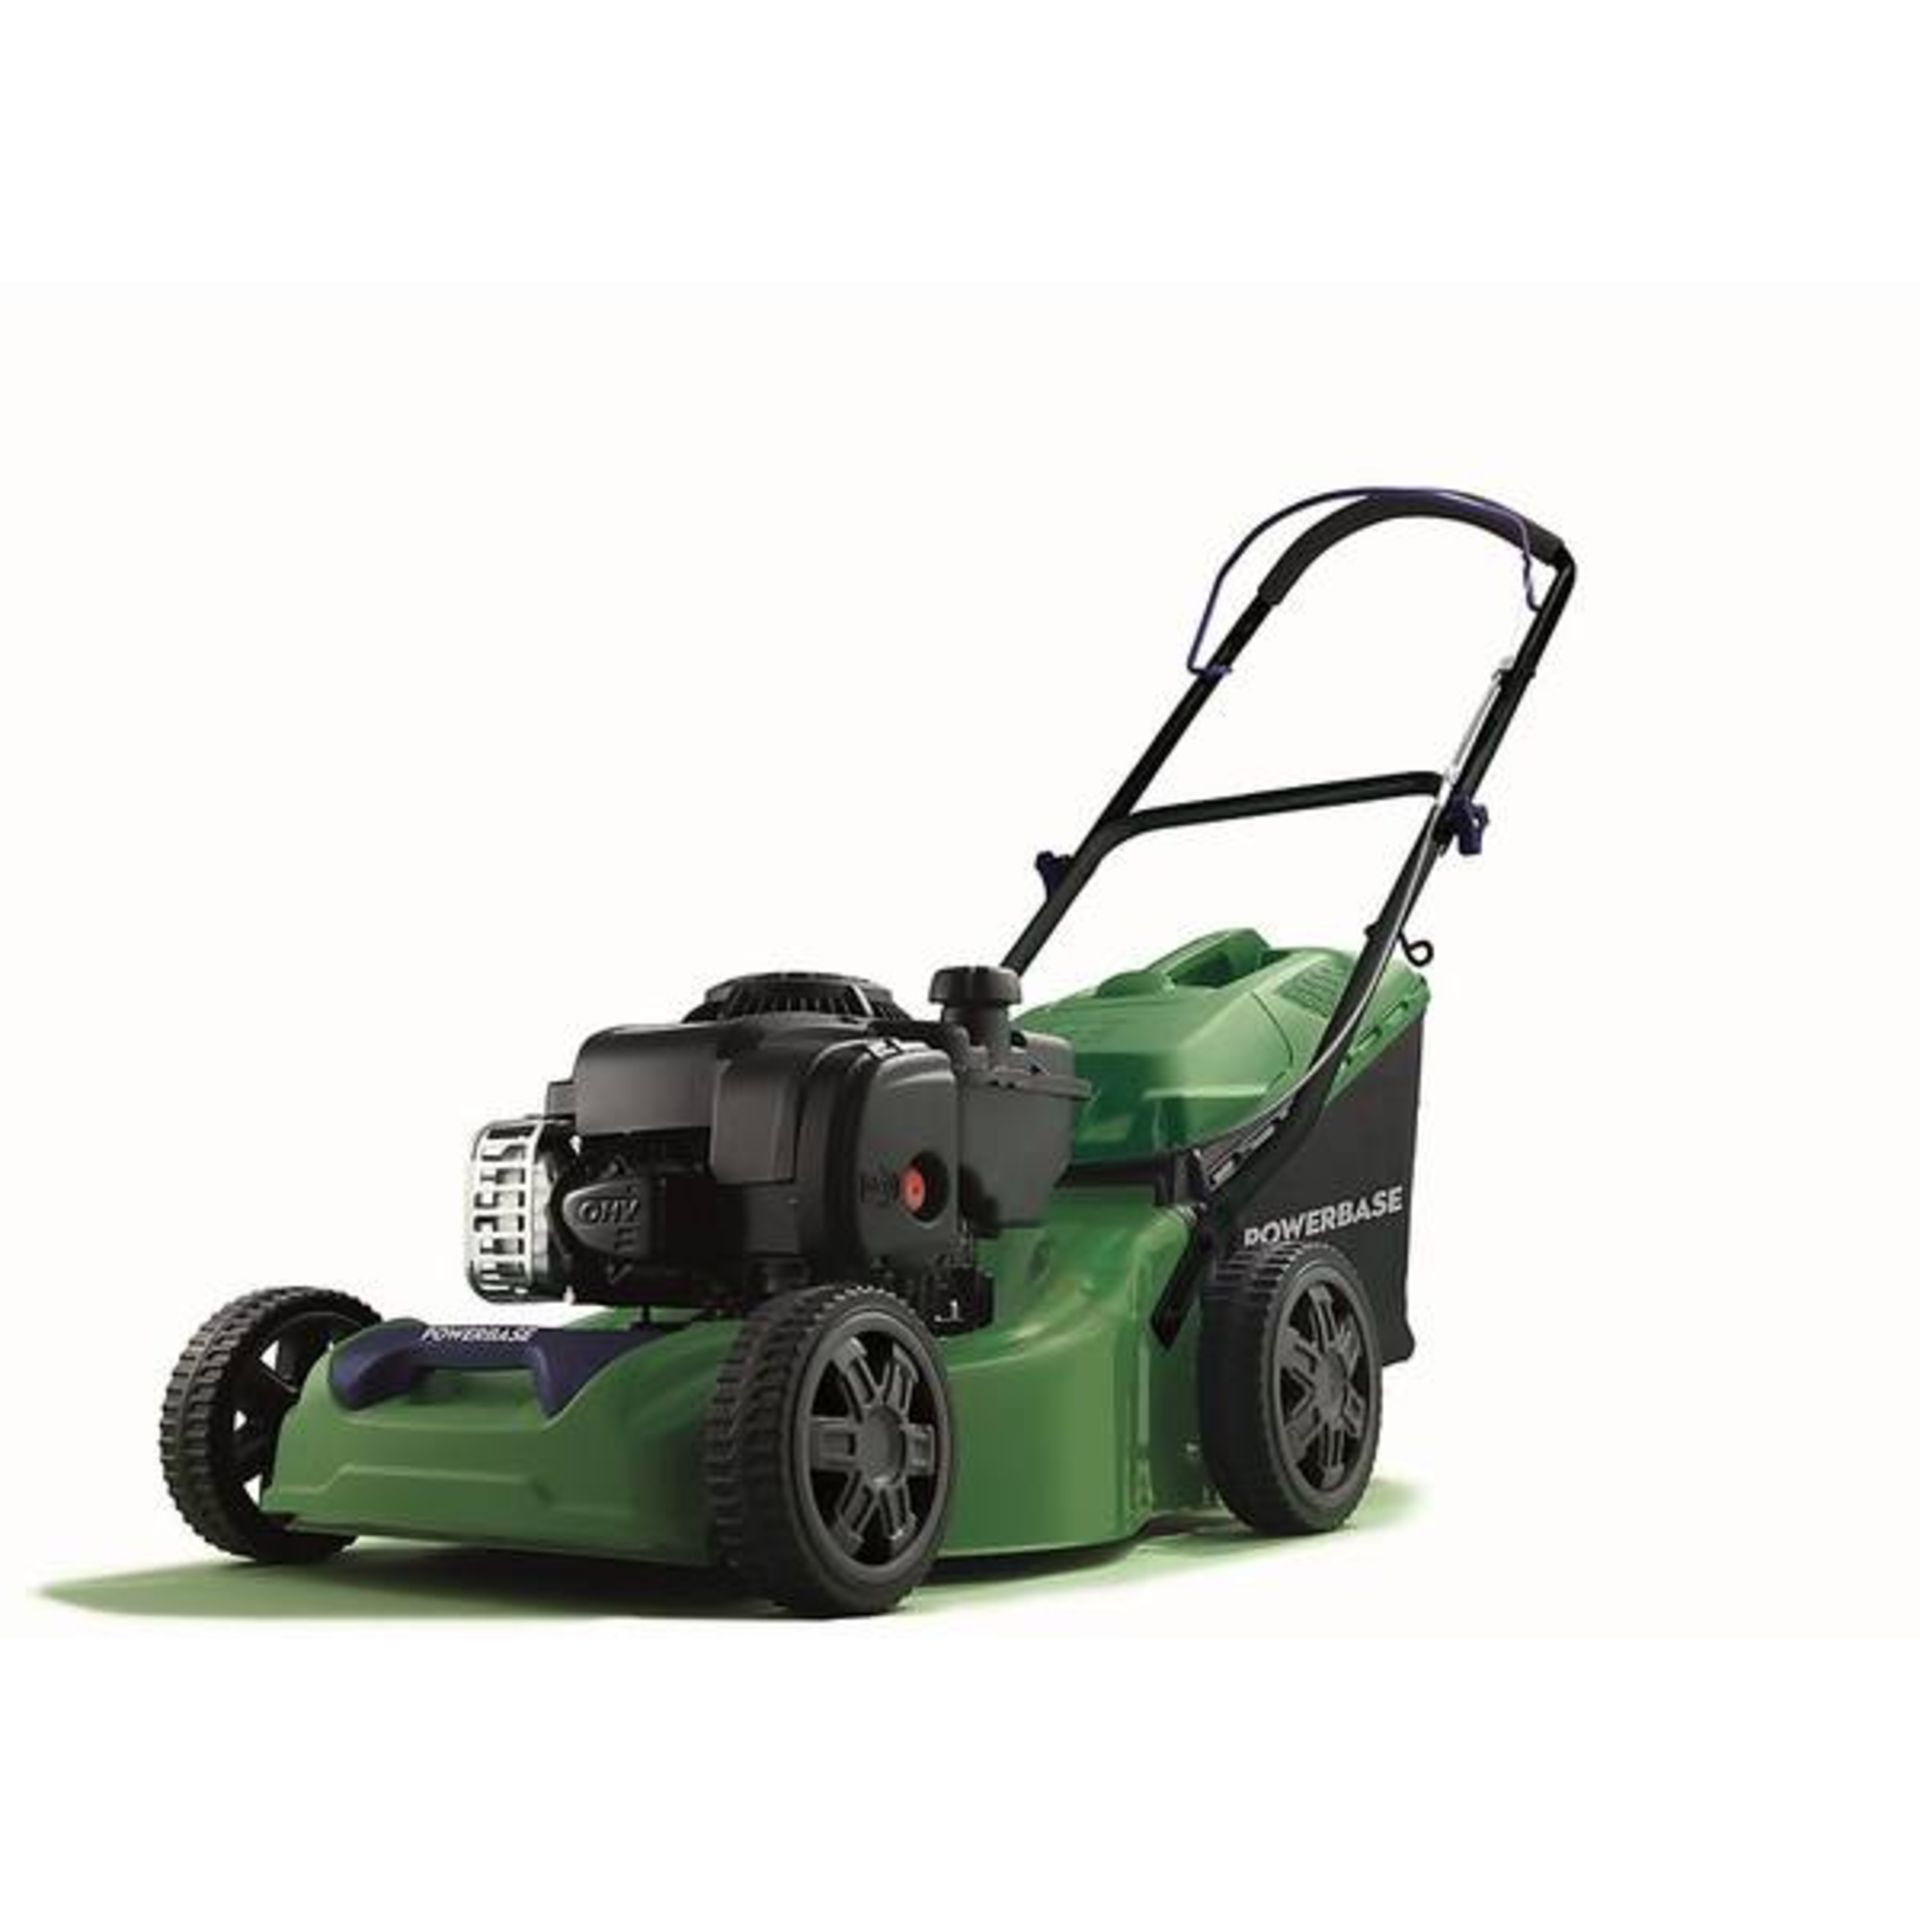 (P5) 1x Powerbase 41cm 125cc Pish Petrol Rotary Lawn Mower. RRP £199.00. Unit Is Clean, Appears N